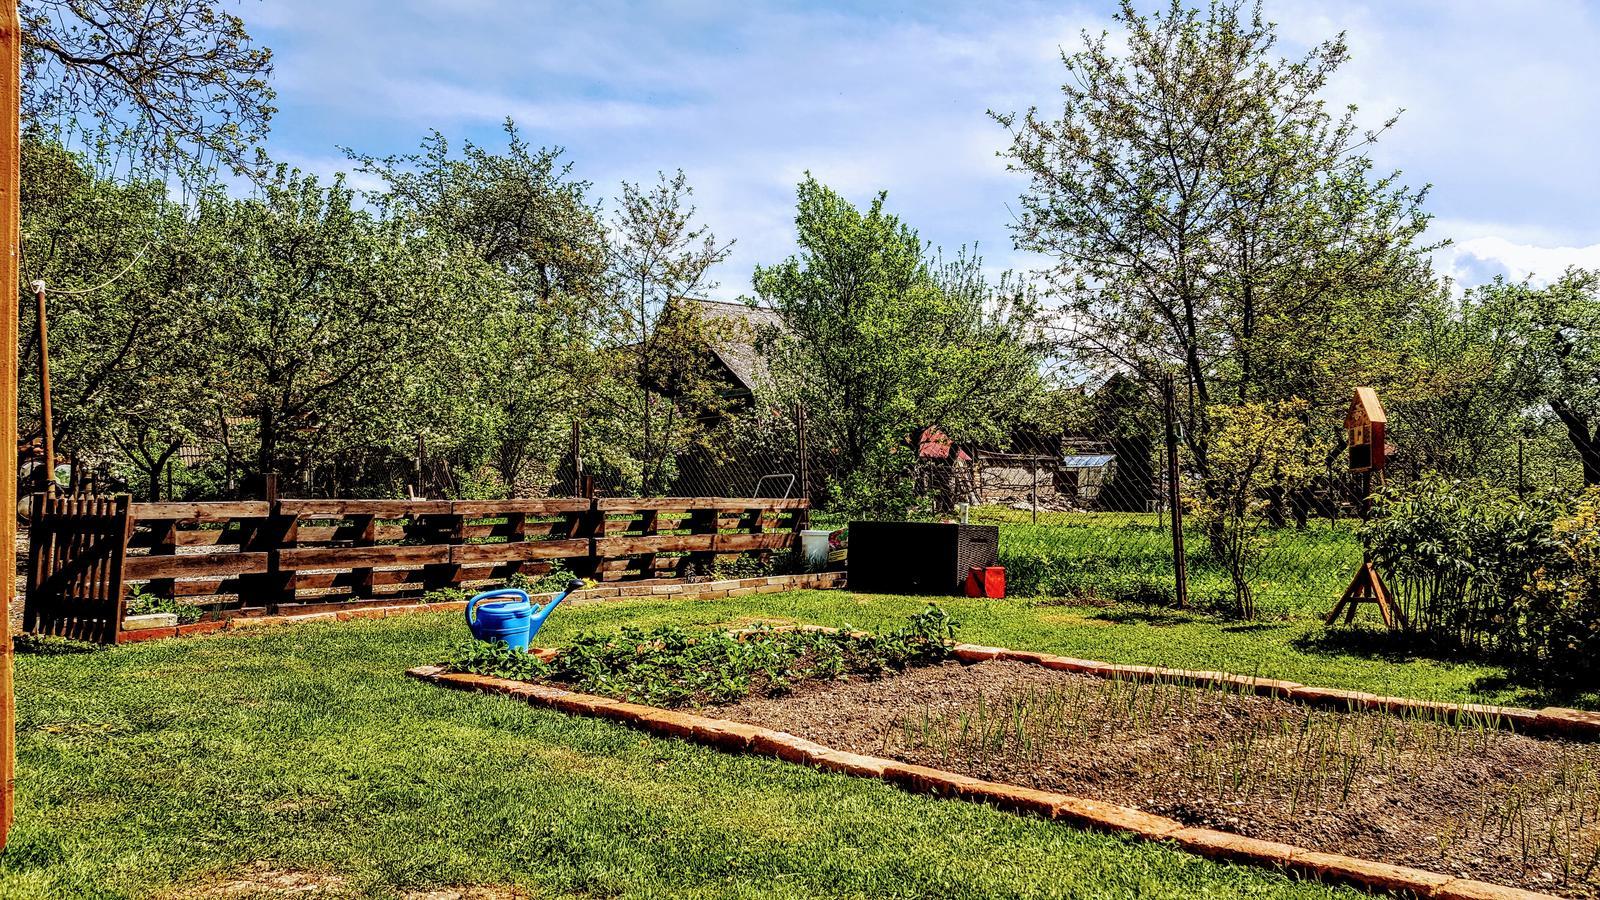 Zahrada a upravy okolo domu - Pomalicky to uz vyzera